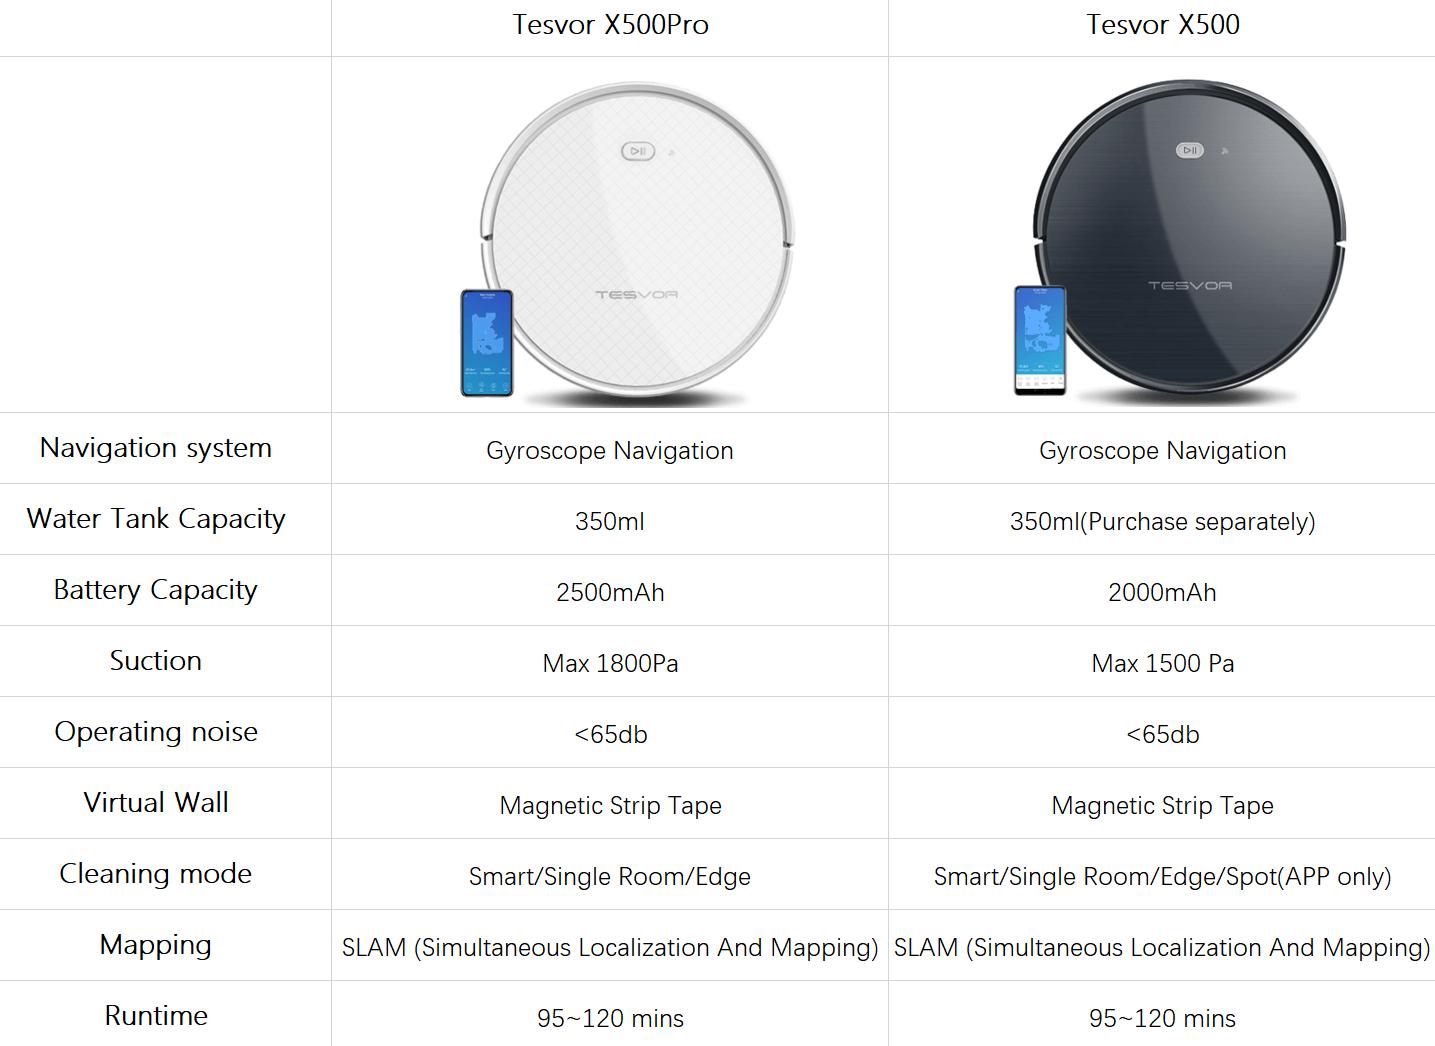 Tesvor X500 Pro VS X500, How to Choose?